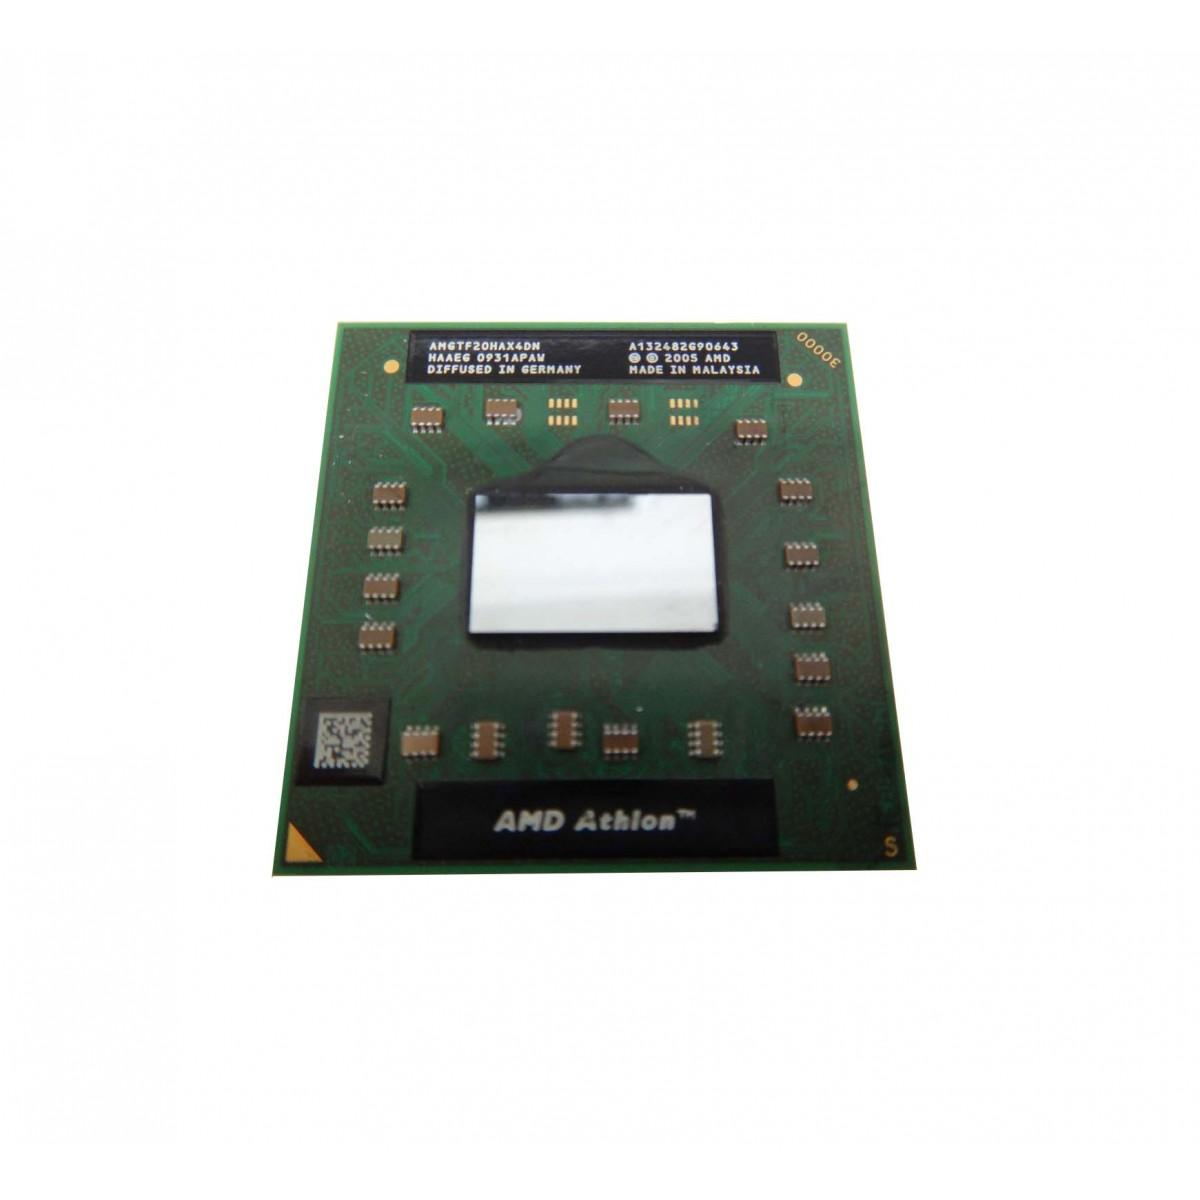 Processador Notebook AMD Athlon 1.6Ghz AMGTF20HAX4DN